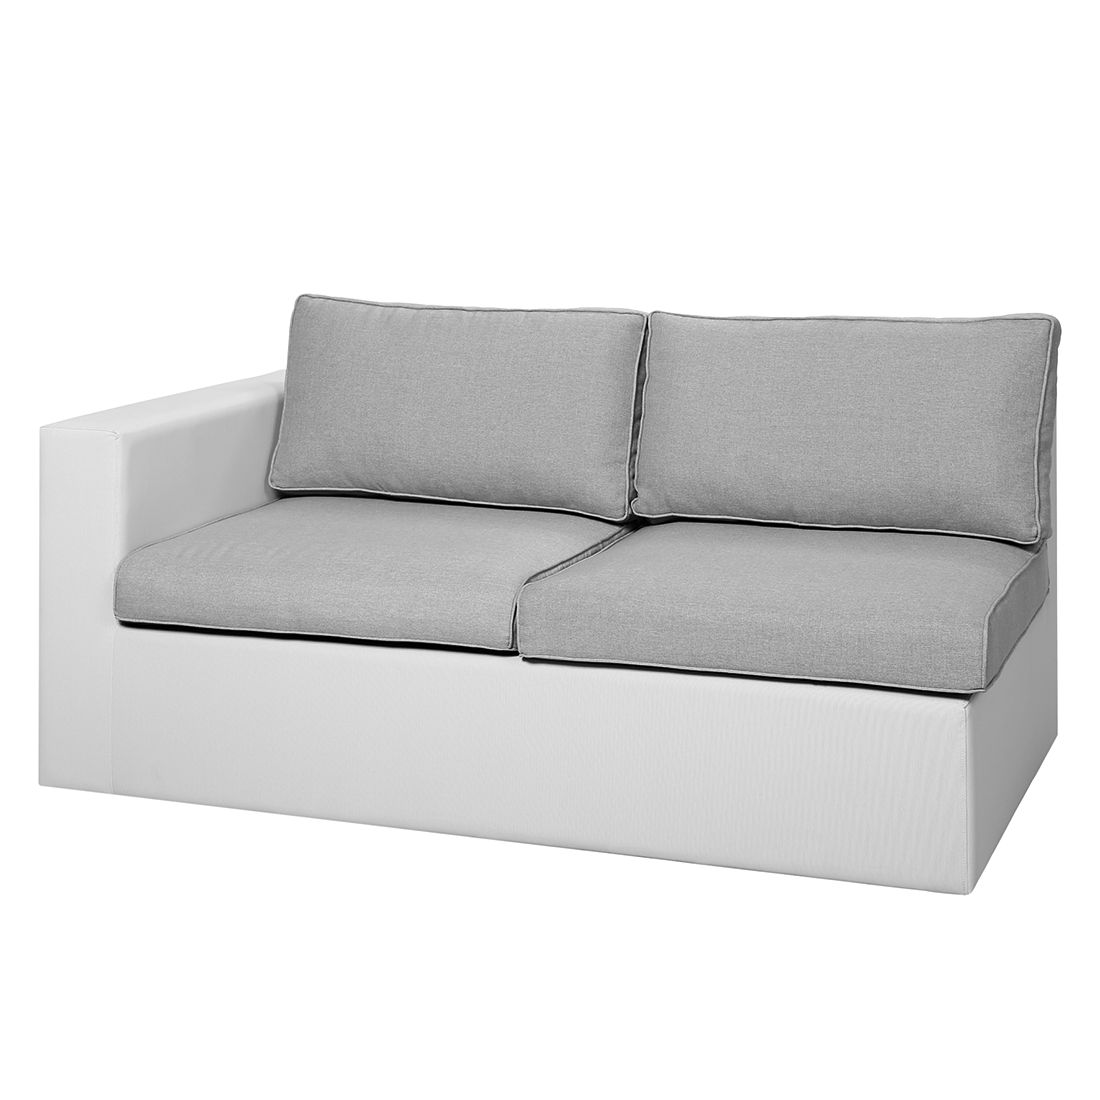 Gartensofa Kuba II - Ergotex - Weiß, Best Freizeitmöbel